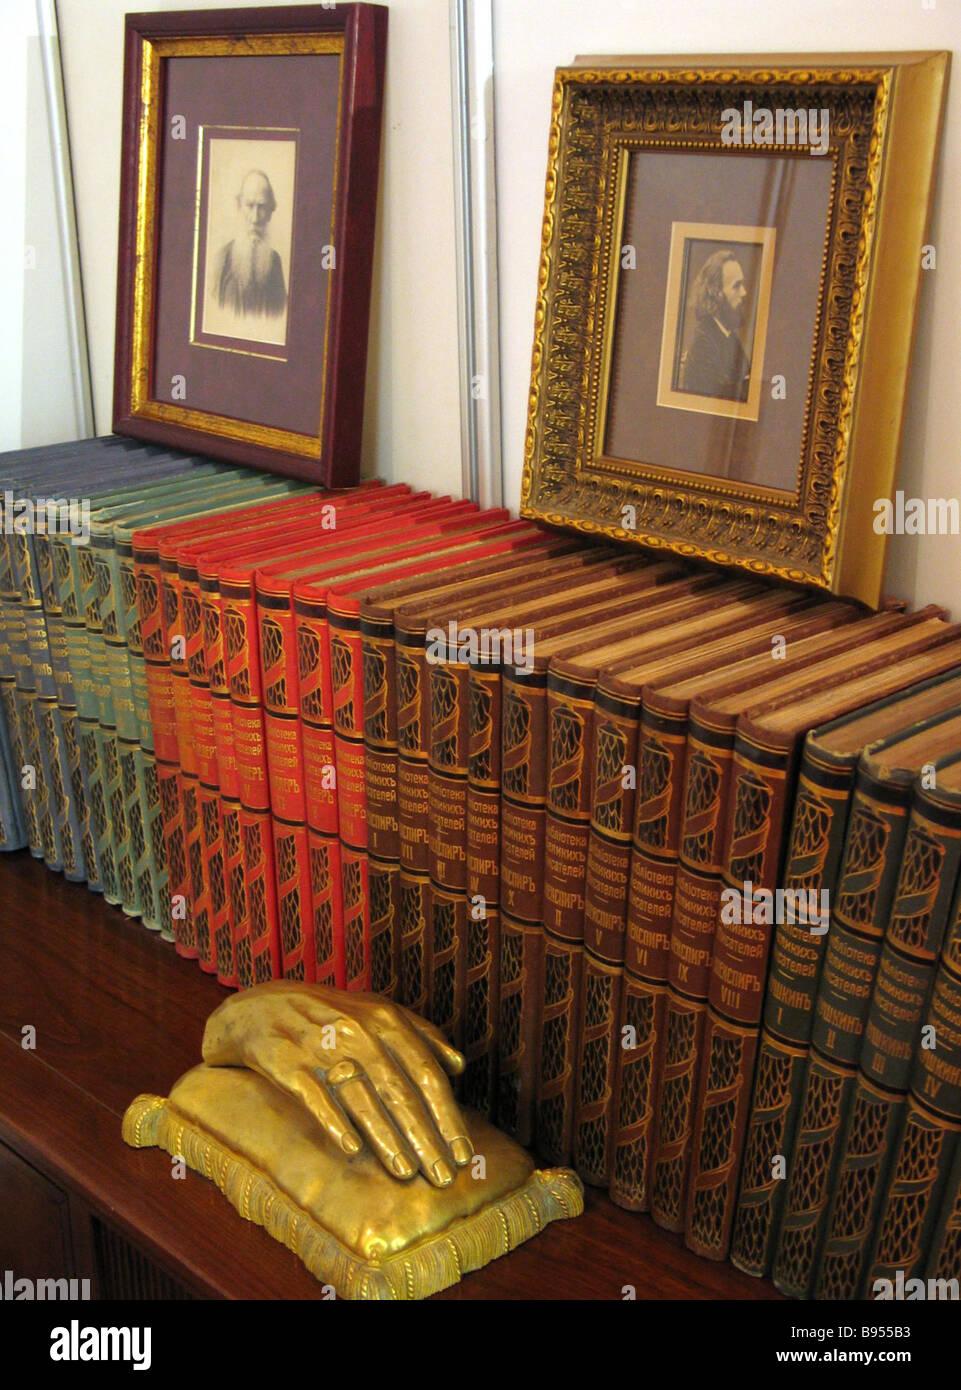 At an antique book fair - Stock Image